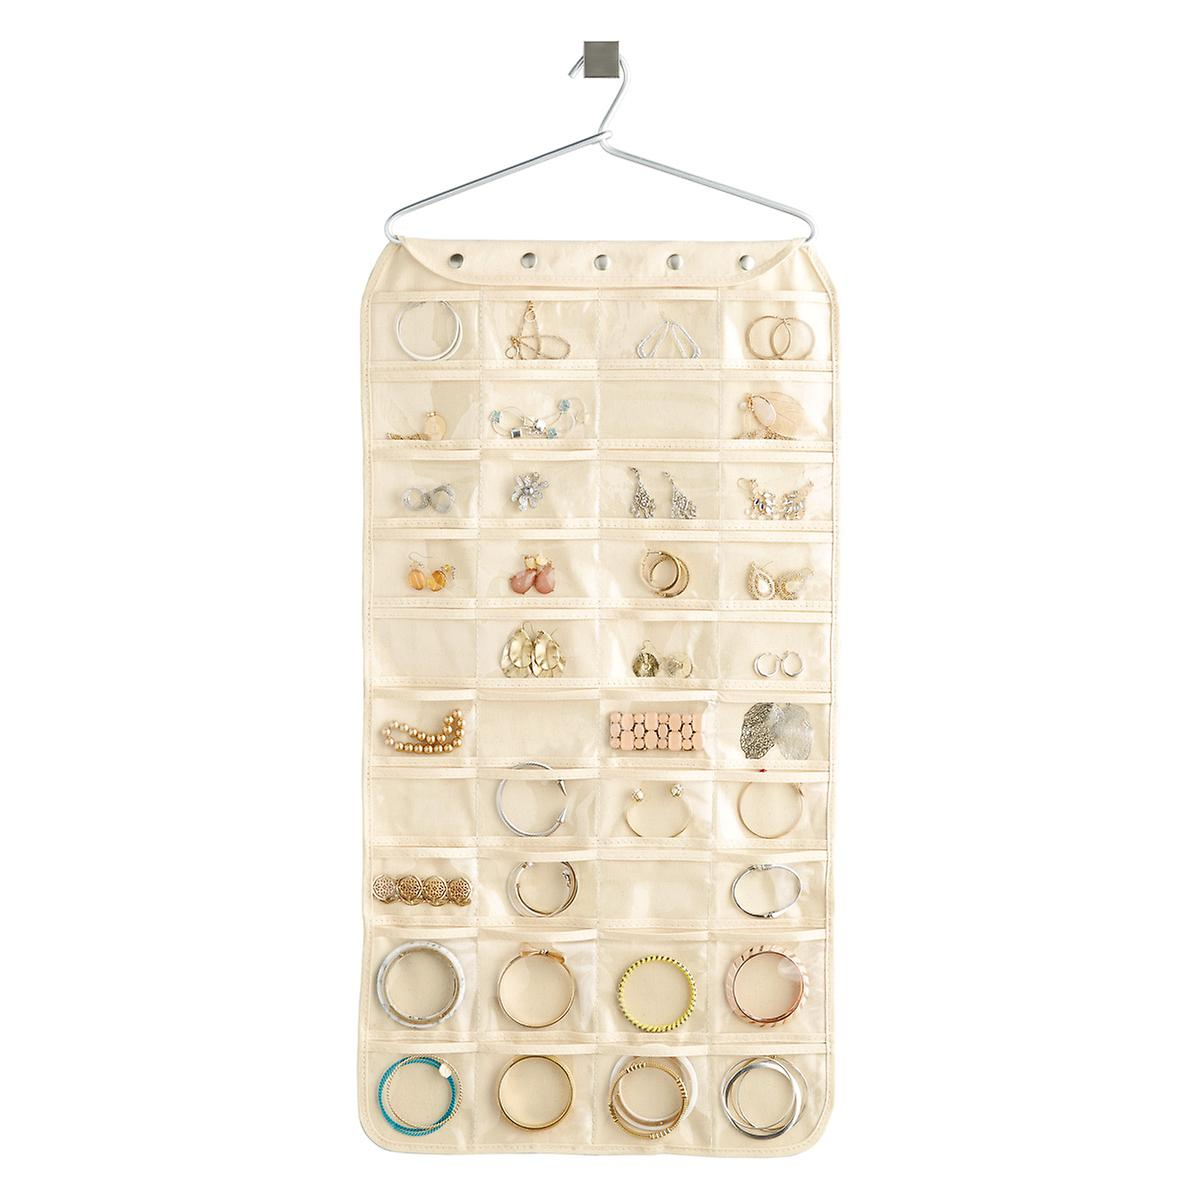 80 Pocket Canvas Hanging Jewelry Organizer